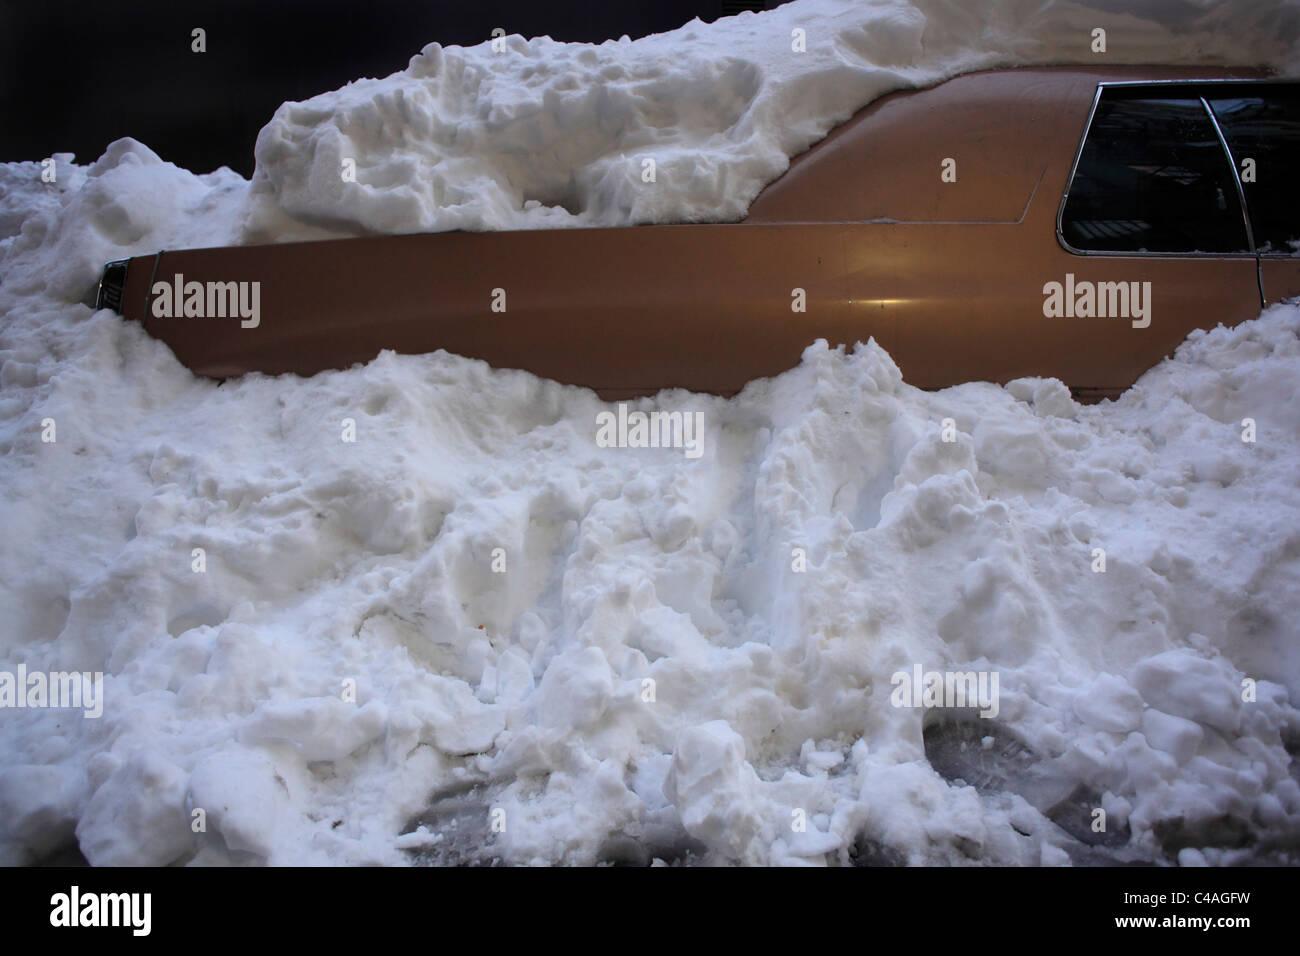 snowed in car - Stock Image